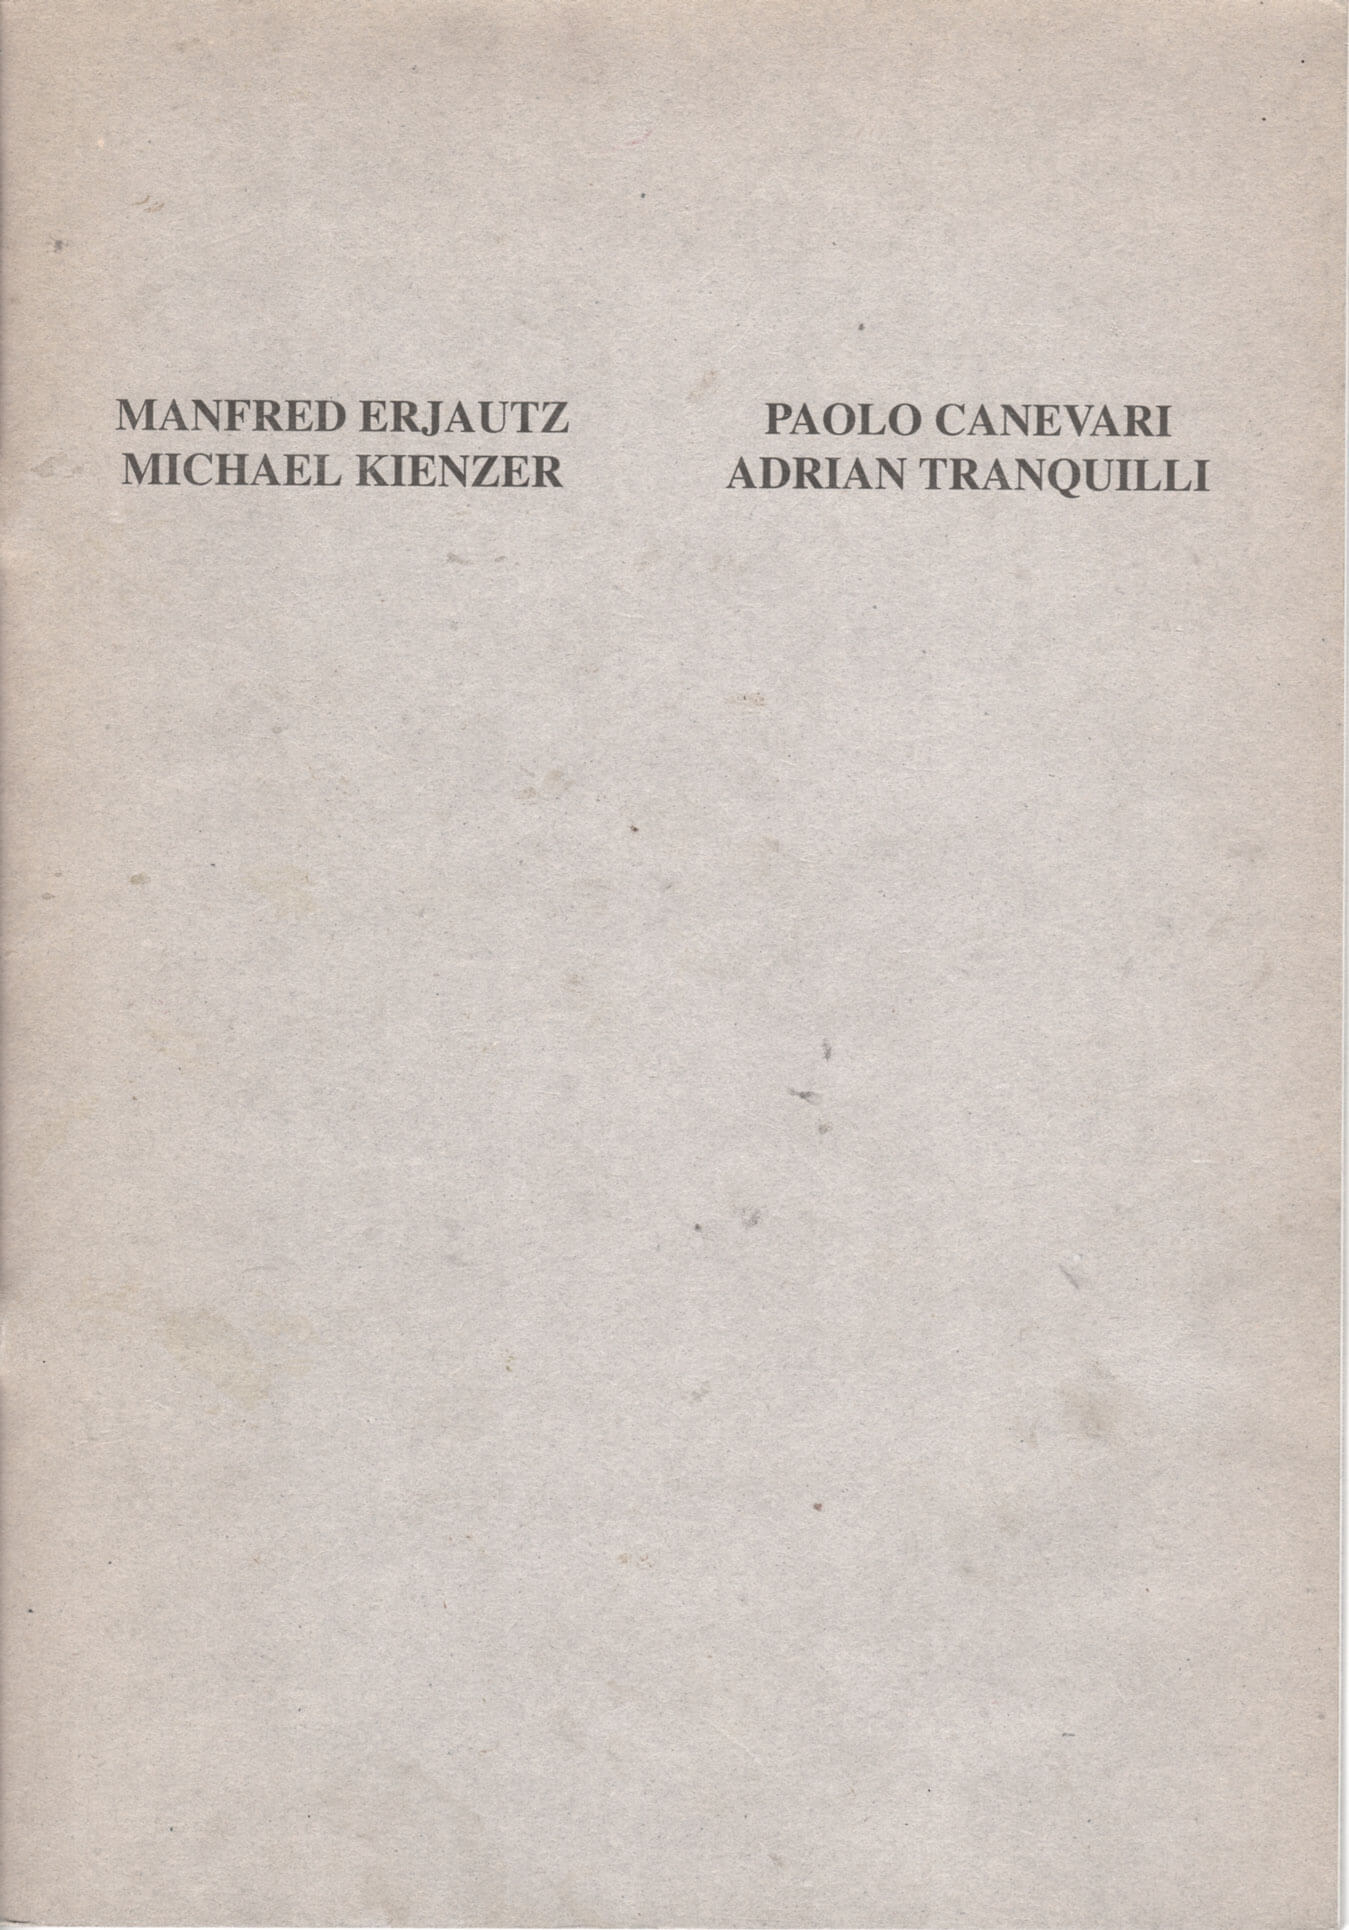 Studio Stefania Miscetti | Catalogues | Erjautz Kienzer Canevari Tranquilli